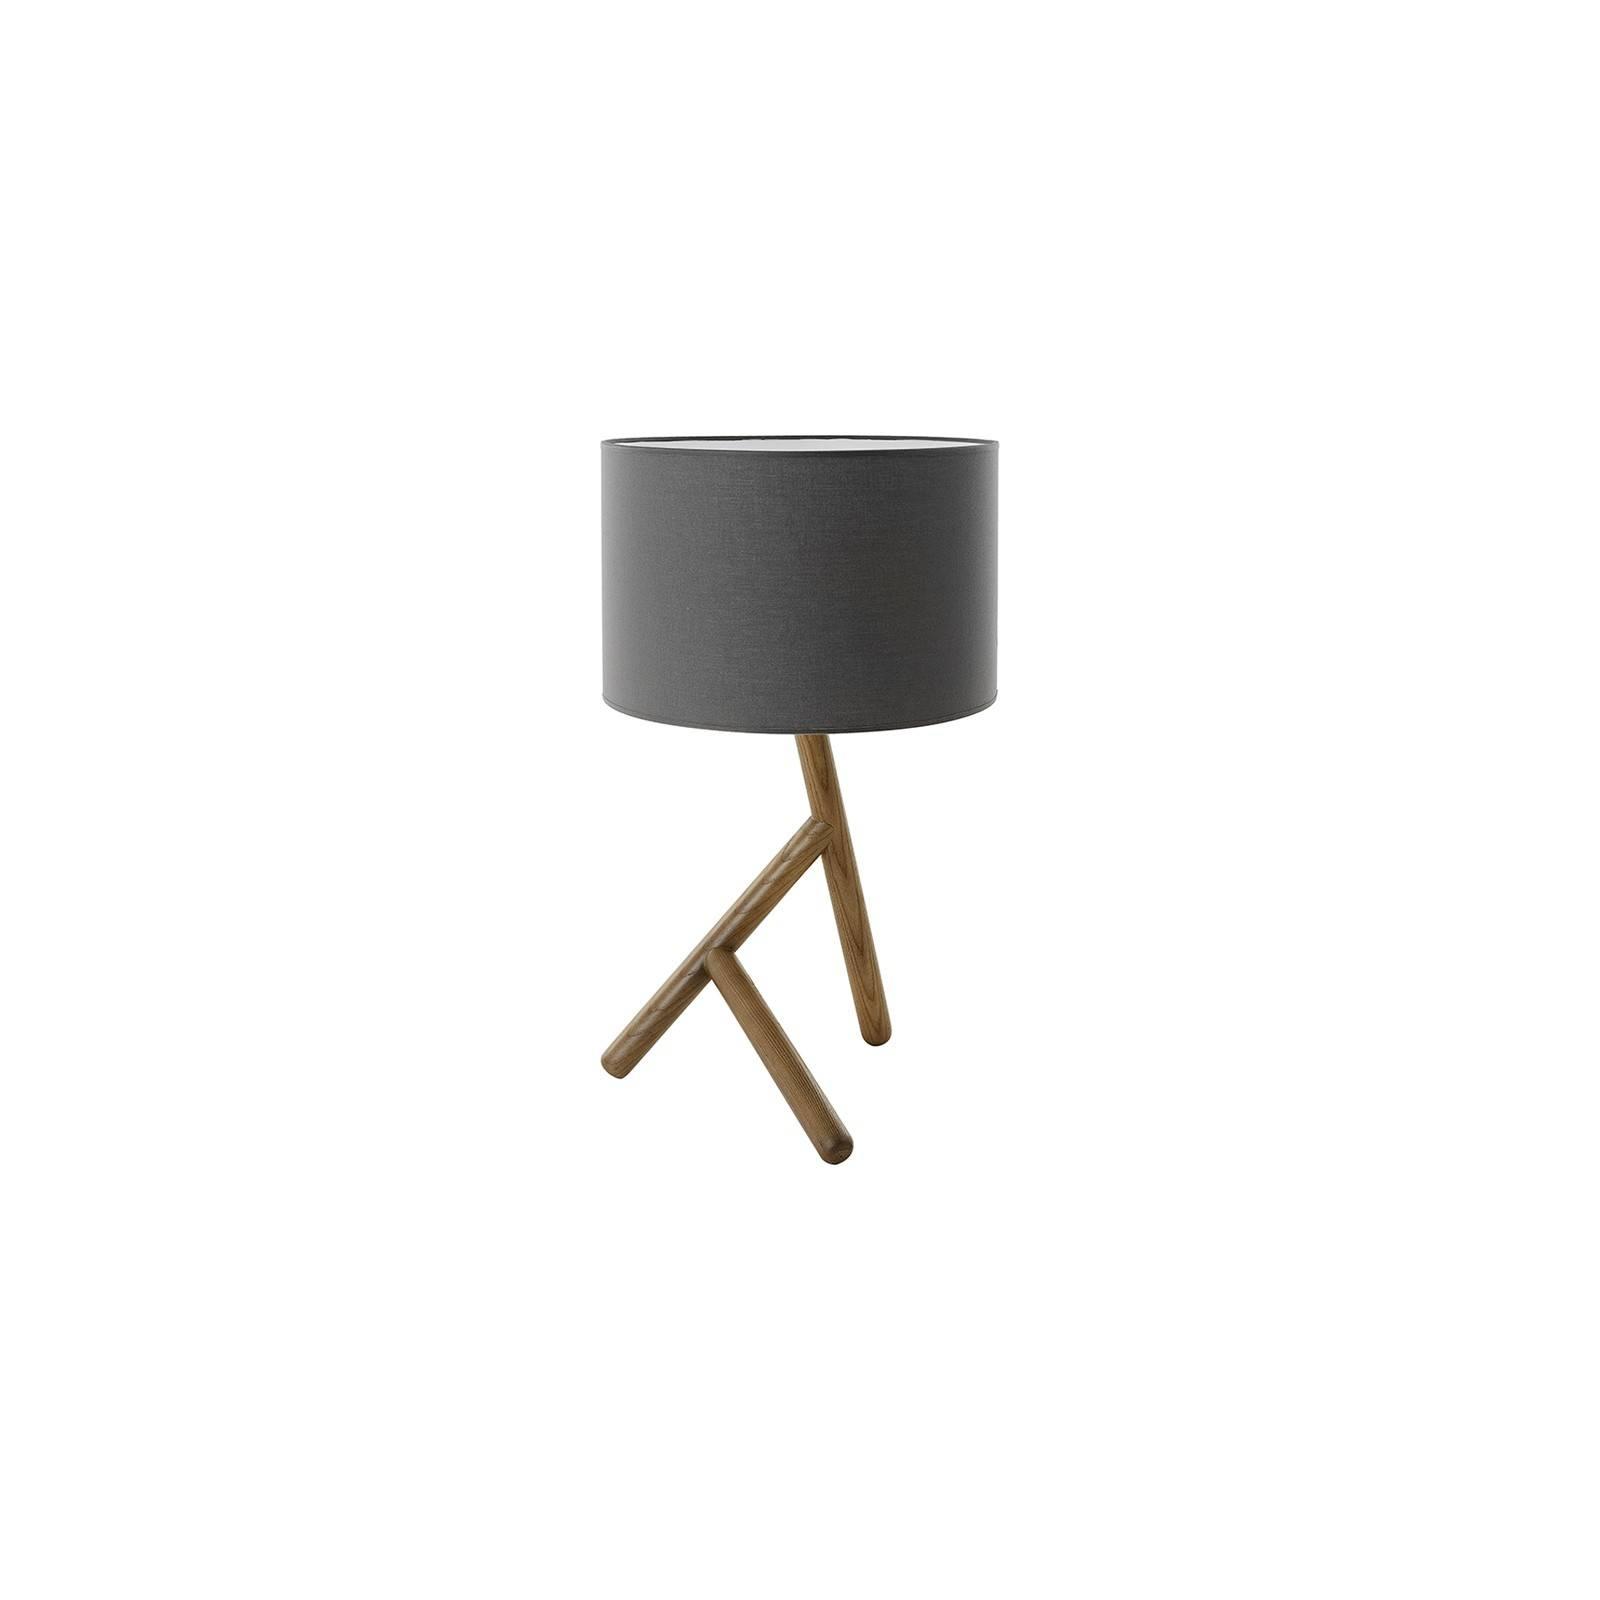 Lampe tripode Basile. Luminaire de designer.